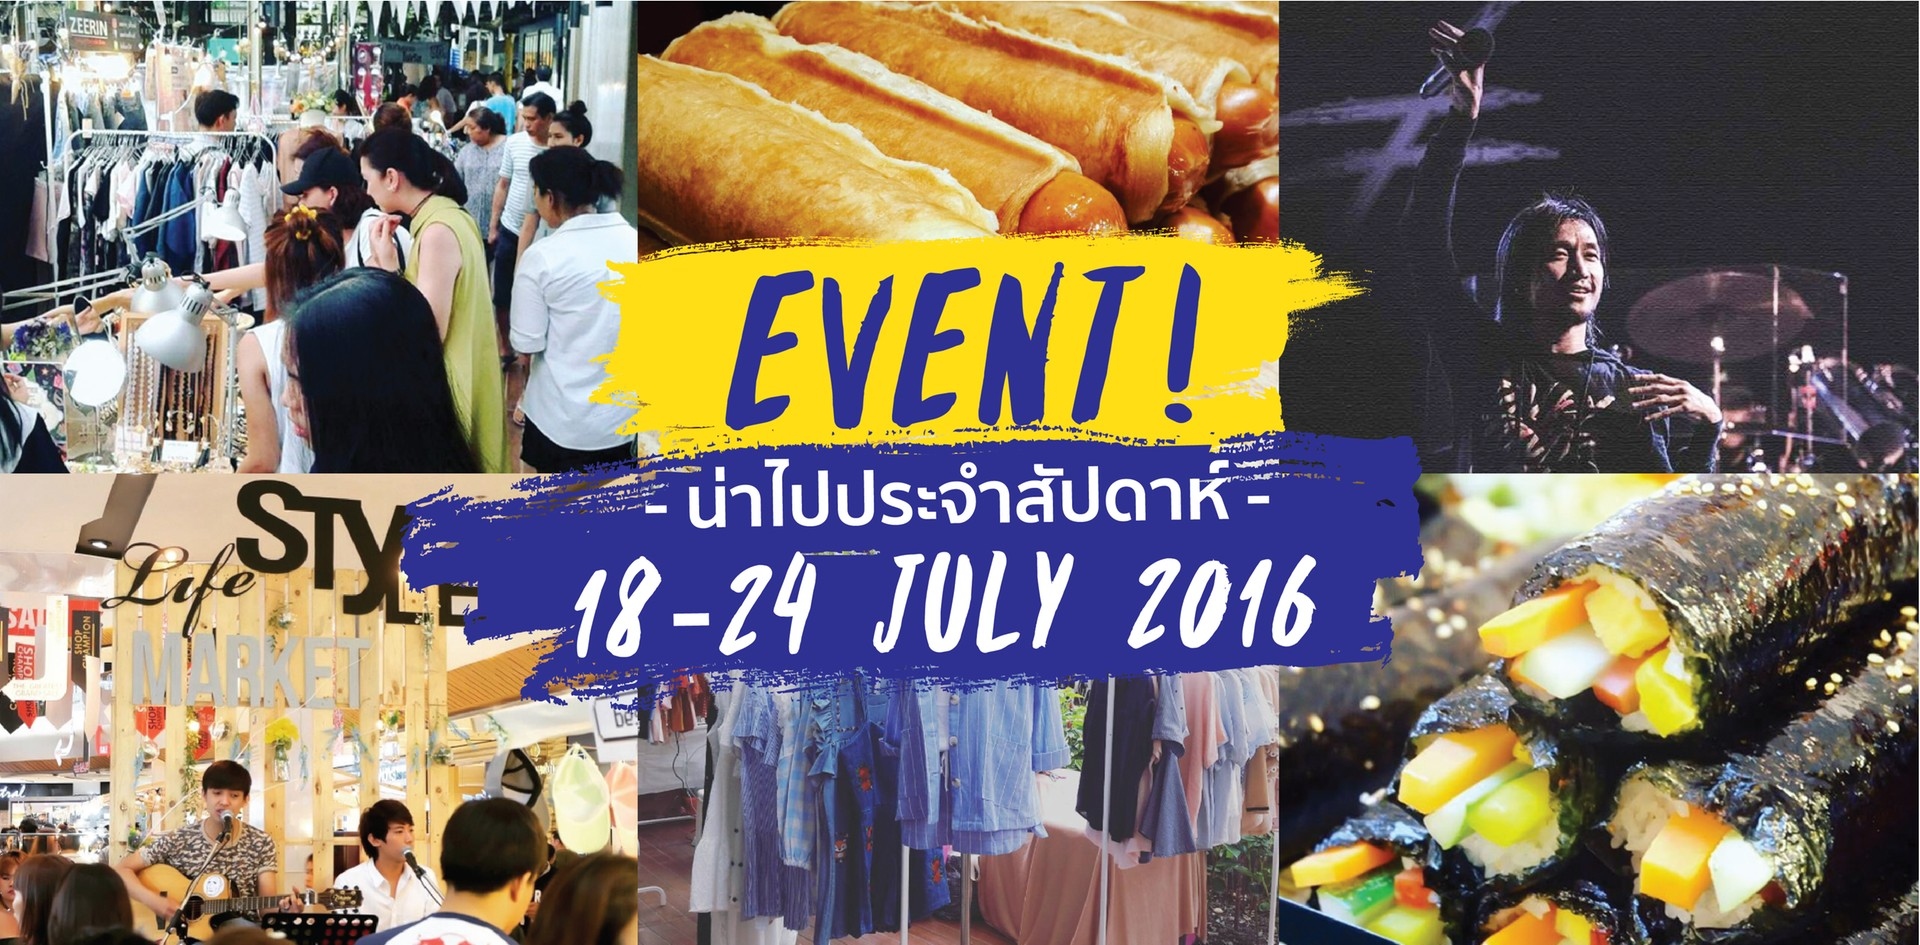 Event น่าไปประจำสัปดาห์ 18-24 July 2016